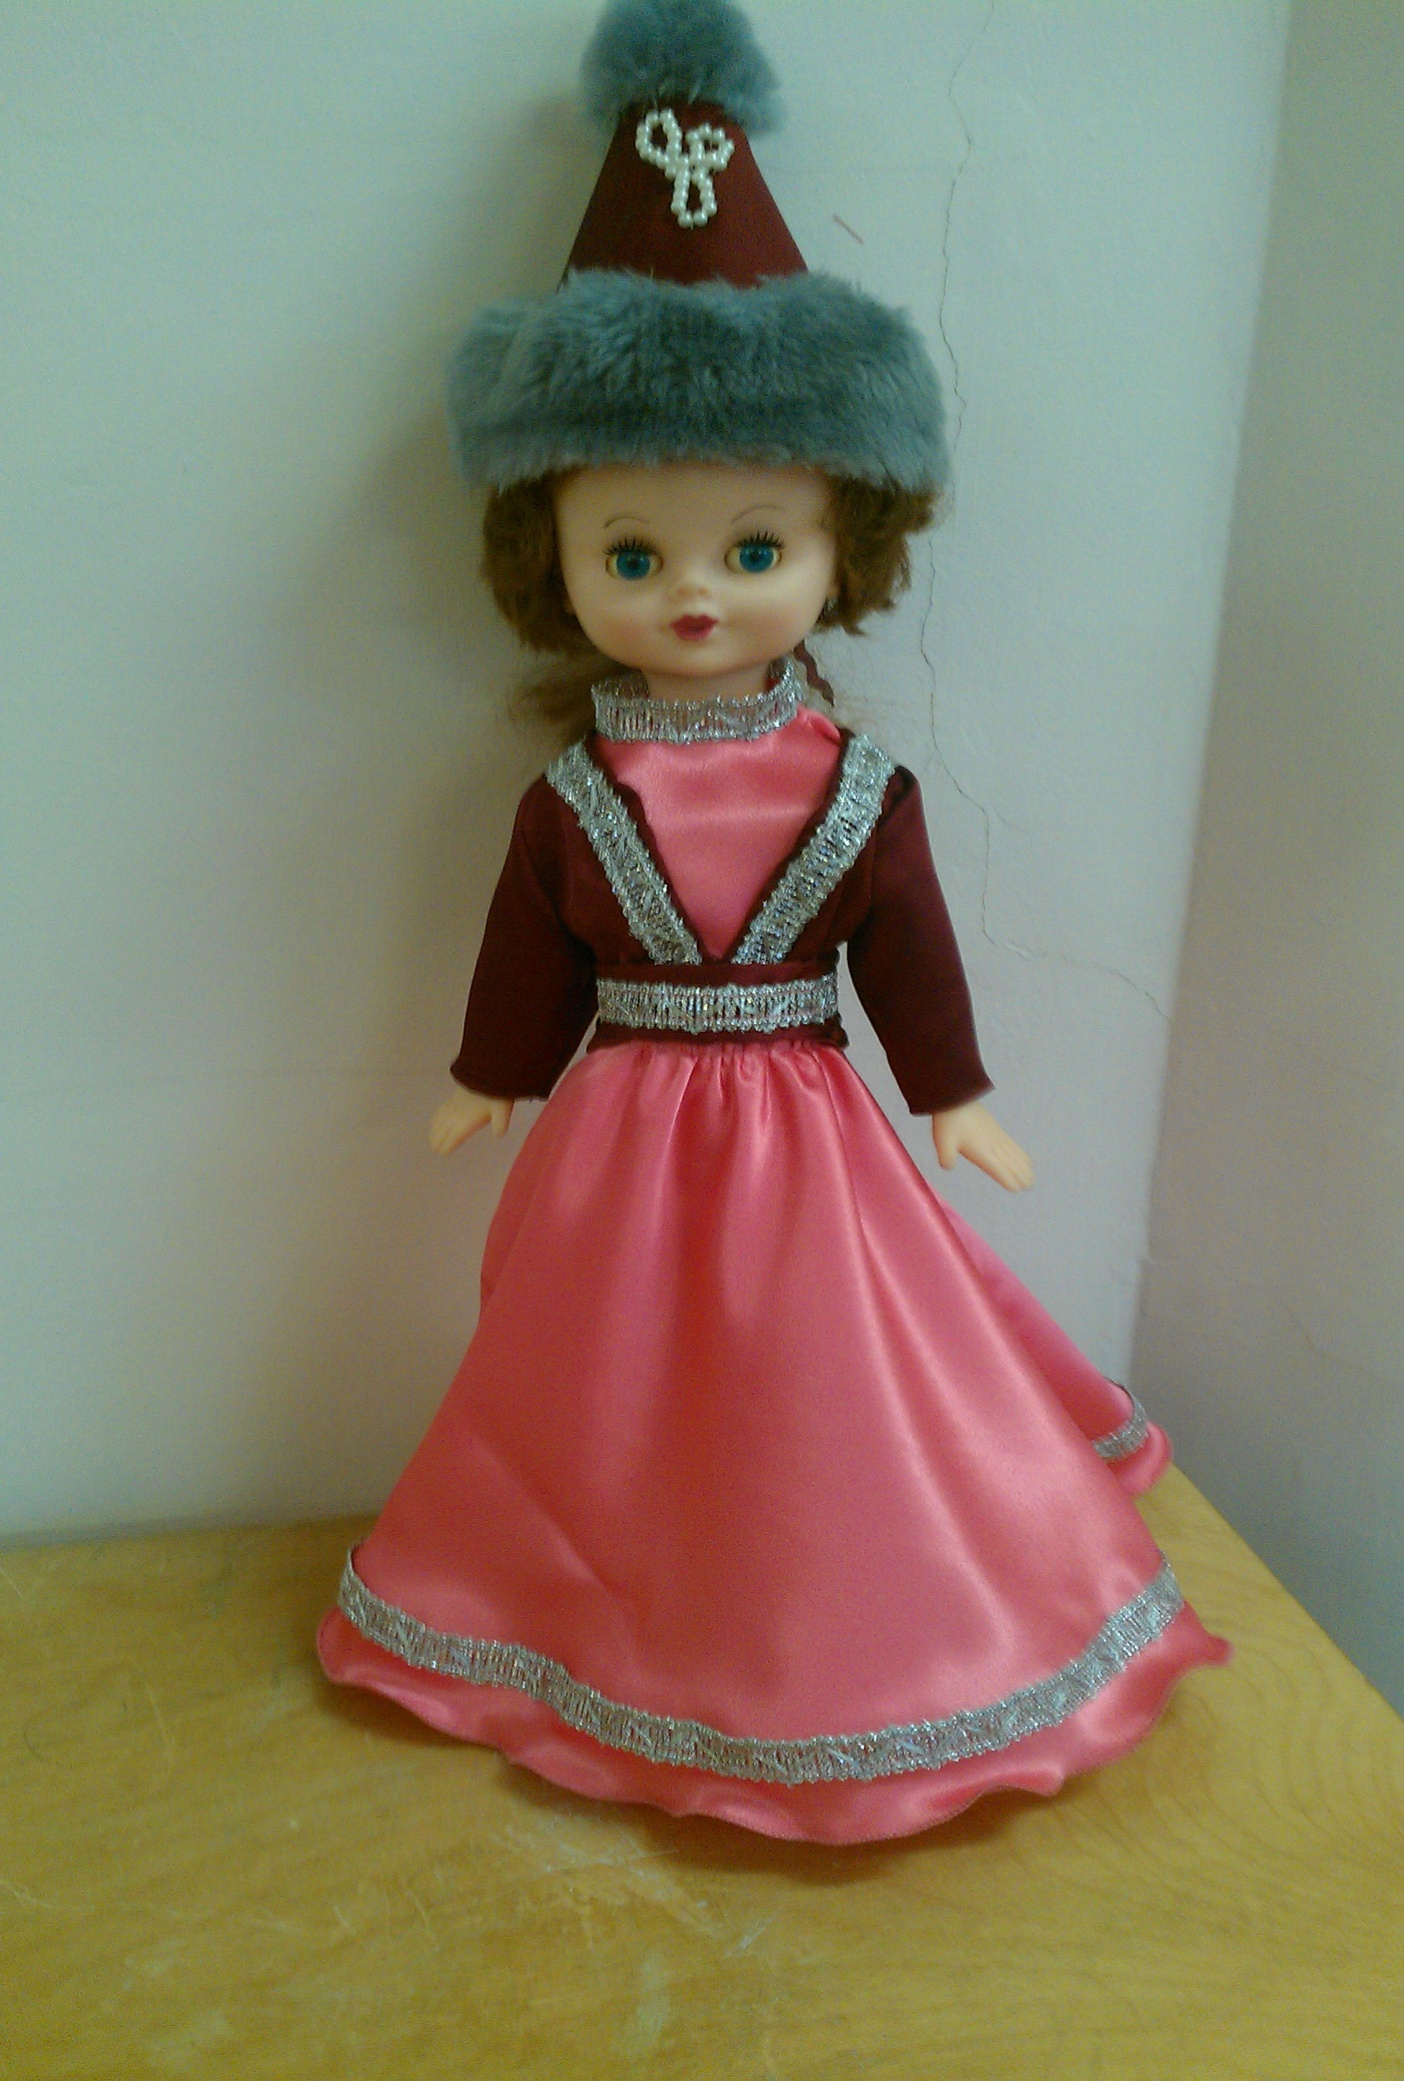 C:\Users\PC\Documents\Моя малая родина 2014\куклы\IMAG2590.jpg